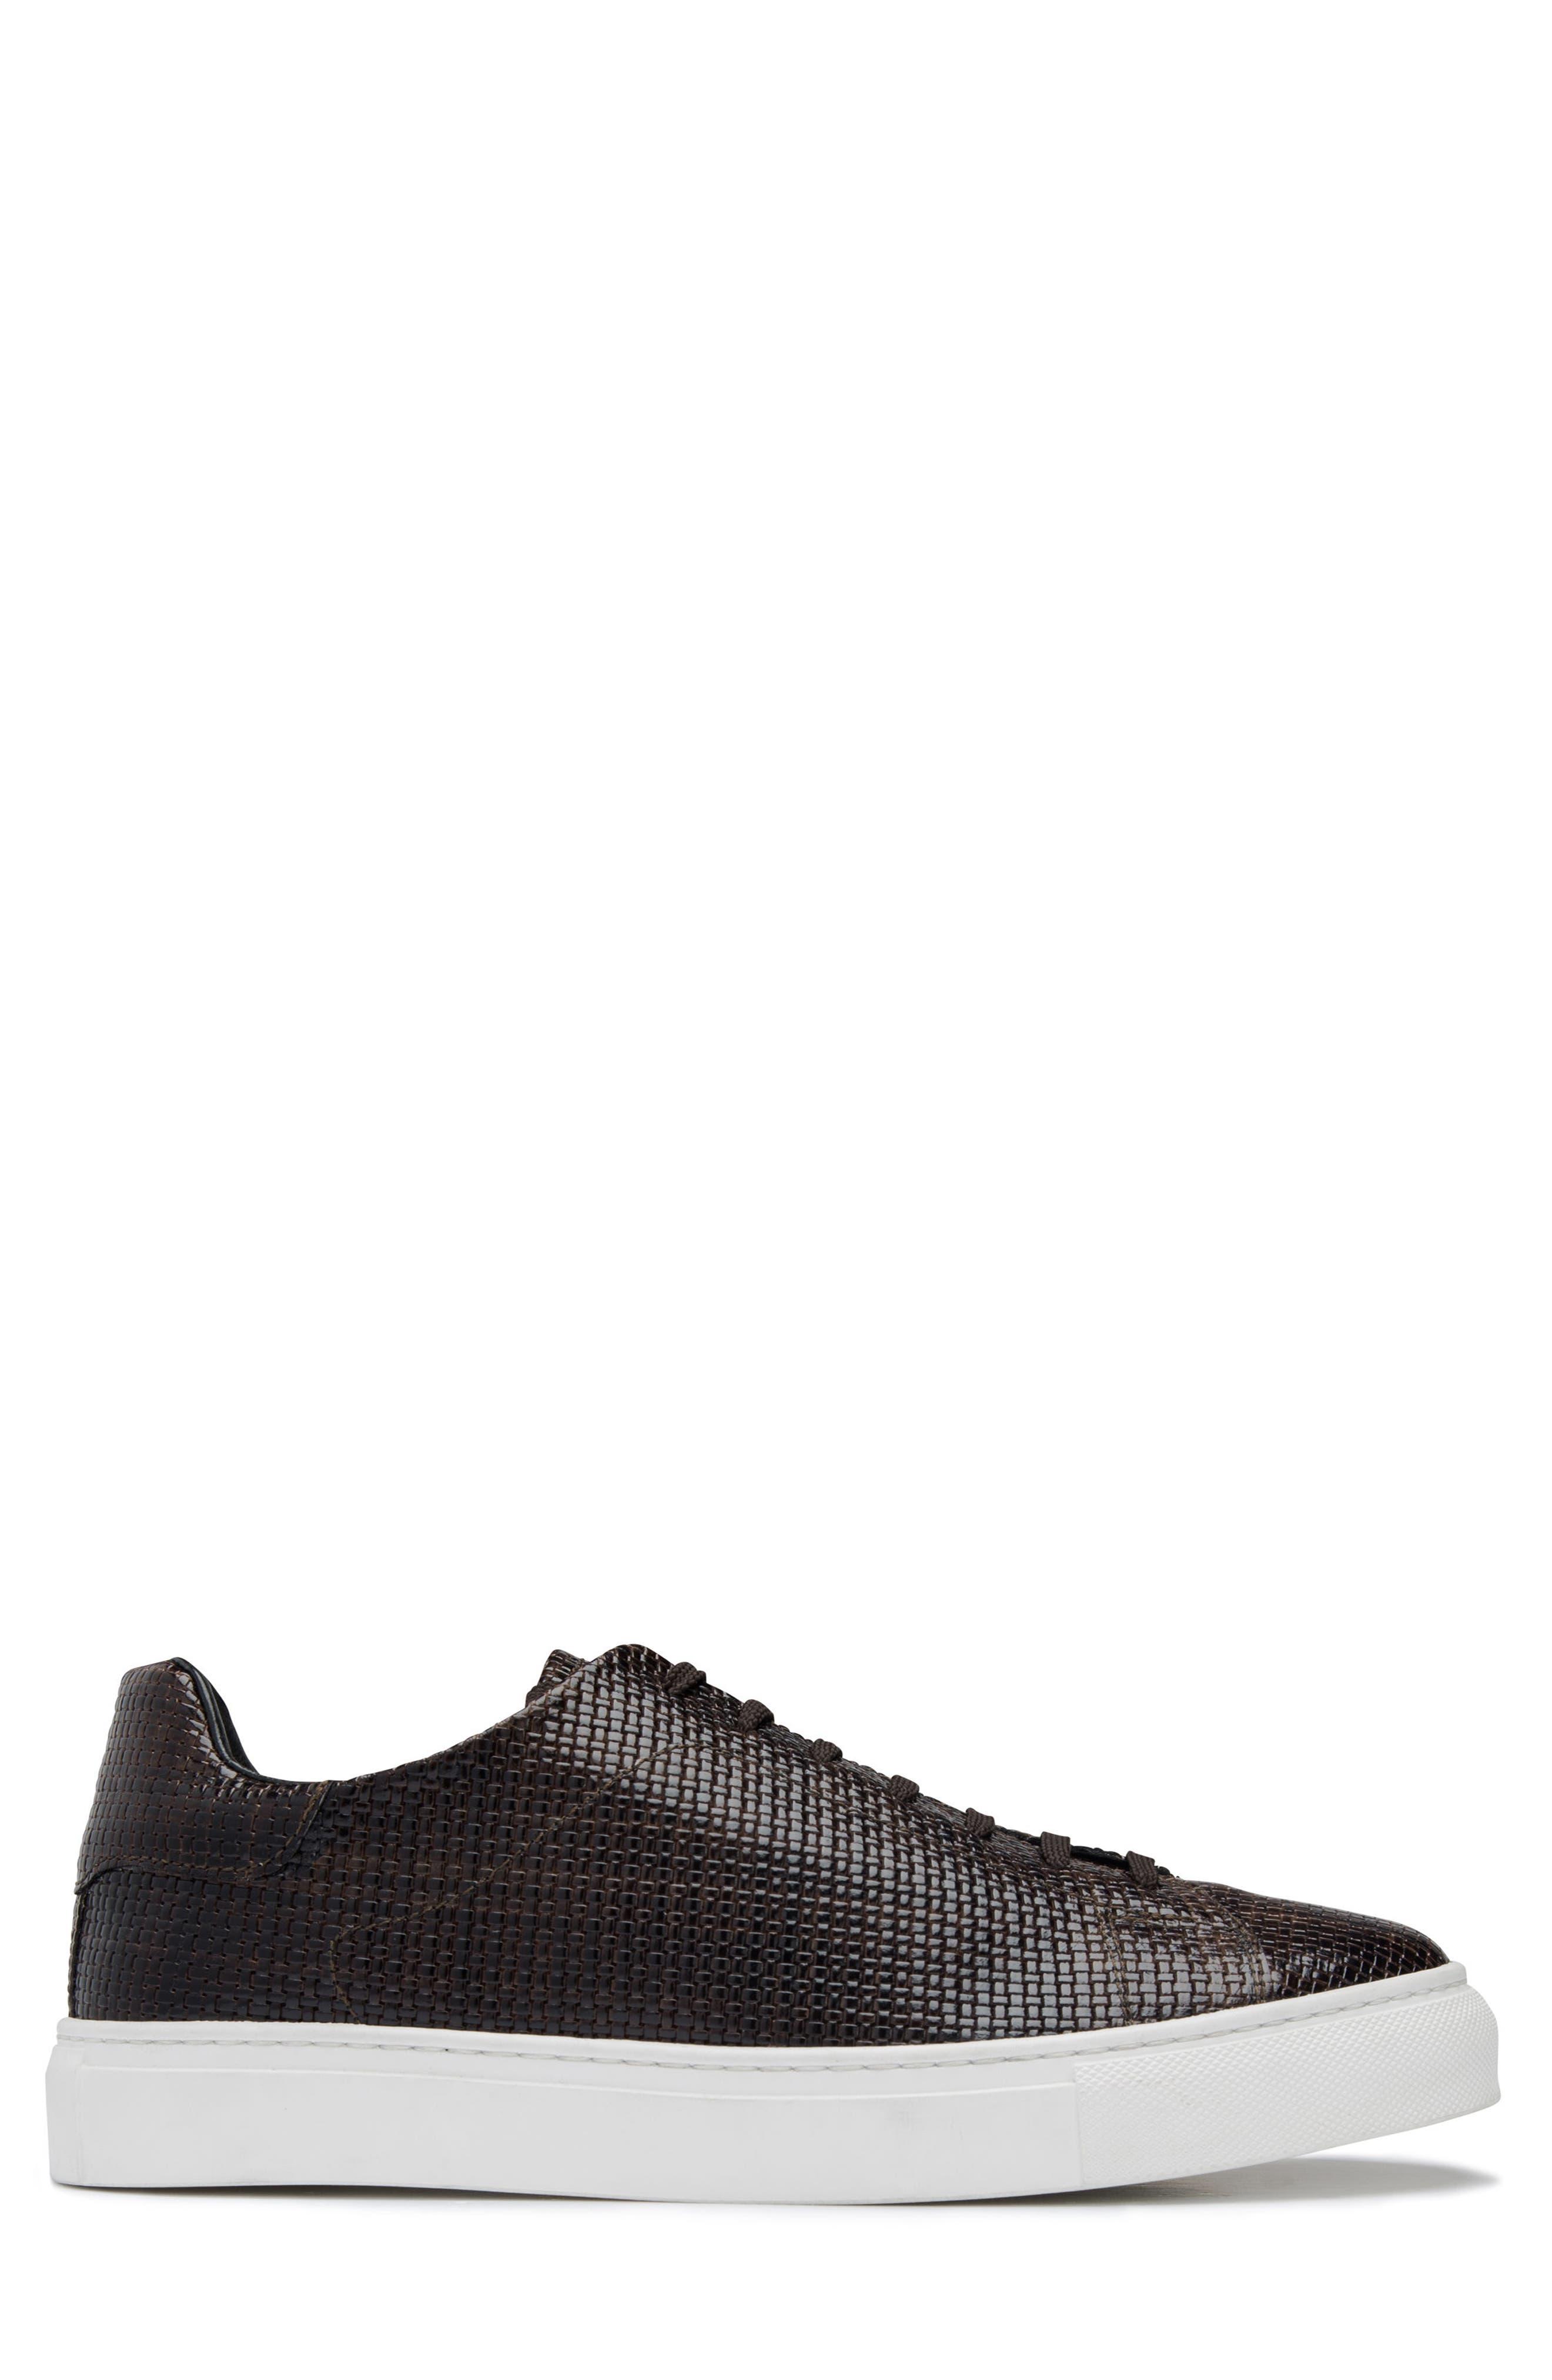 Wimbledon Sneaker,                             Alternate thumbnail 3, color,                             TESTA DI MORO